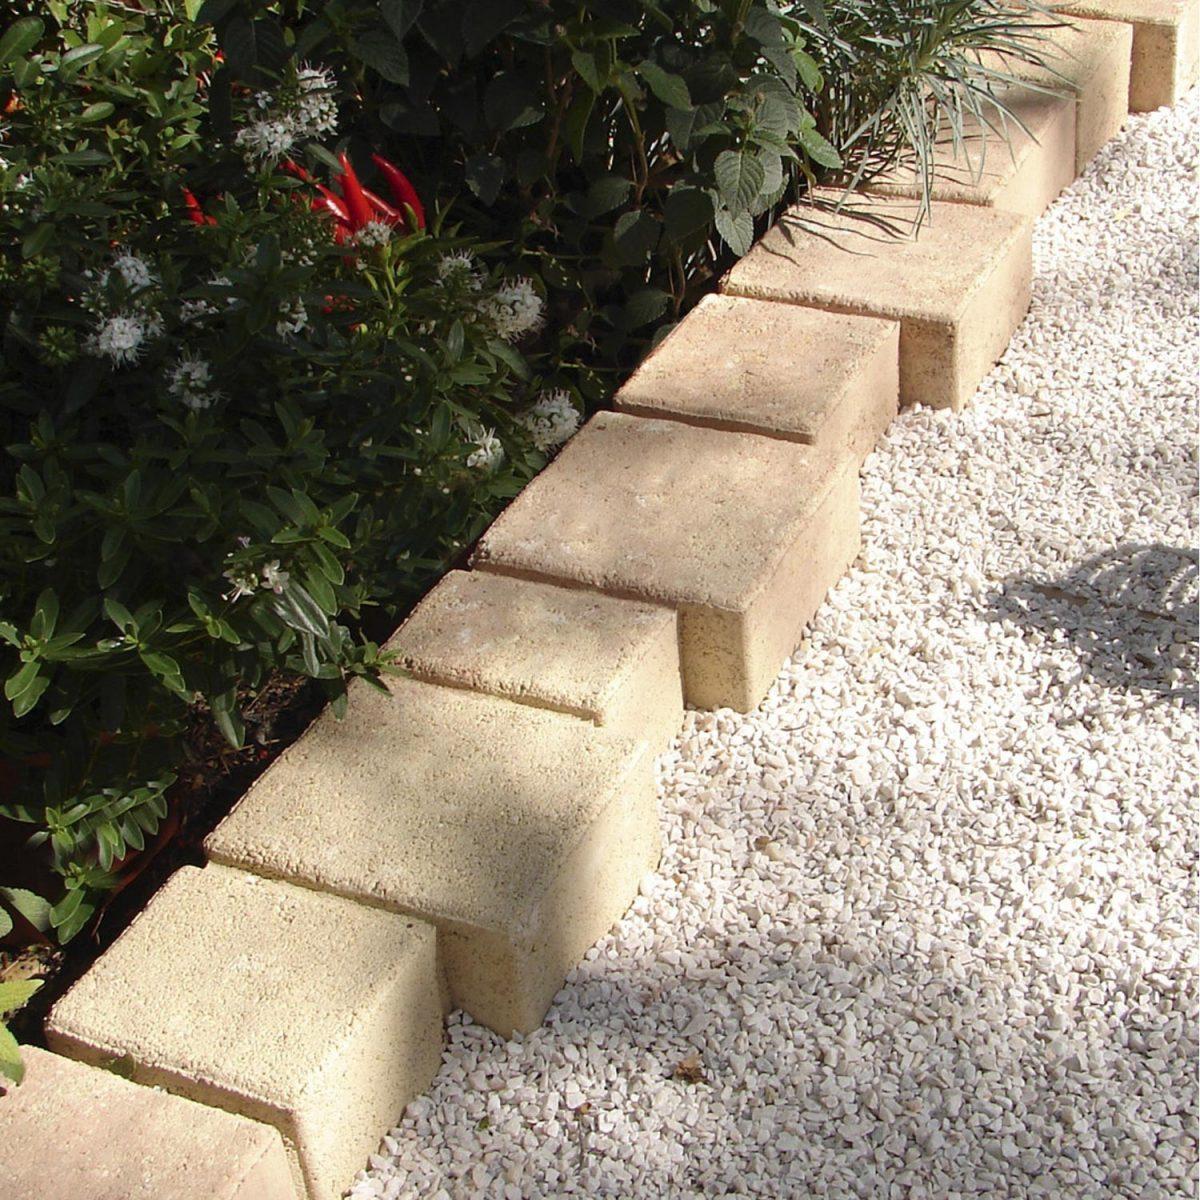 Bordure De Jardin Beton Leroy Merlin Ides Inspires Pour La Serapportanta Bordure De Jardin Leroy Merlin Idees Conception Jardin Idees Conception Jardin